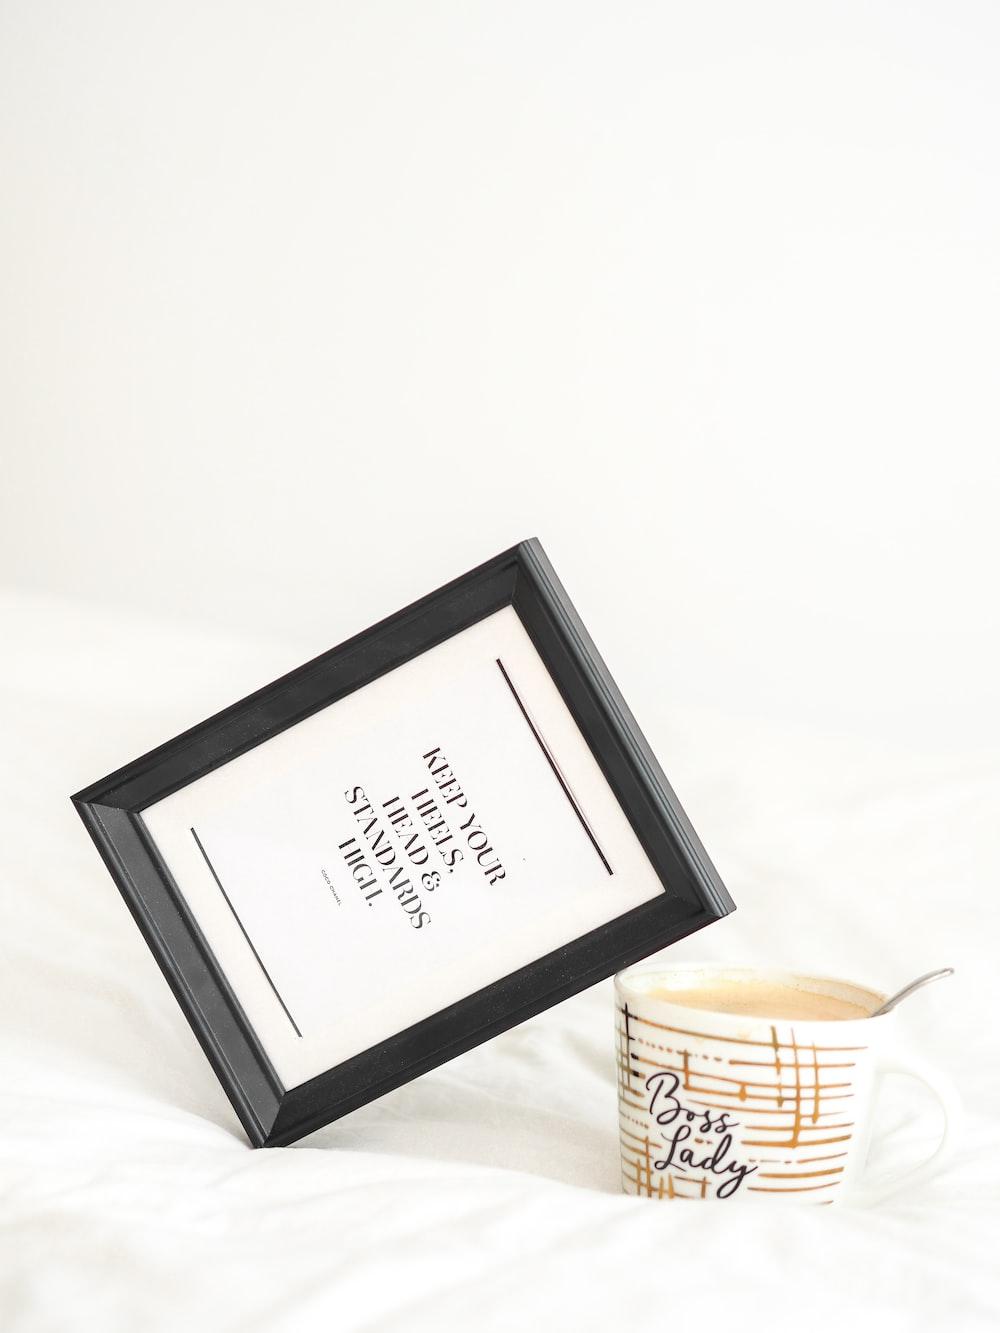 black wooden frame with white printer paper